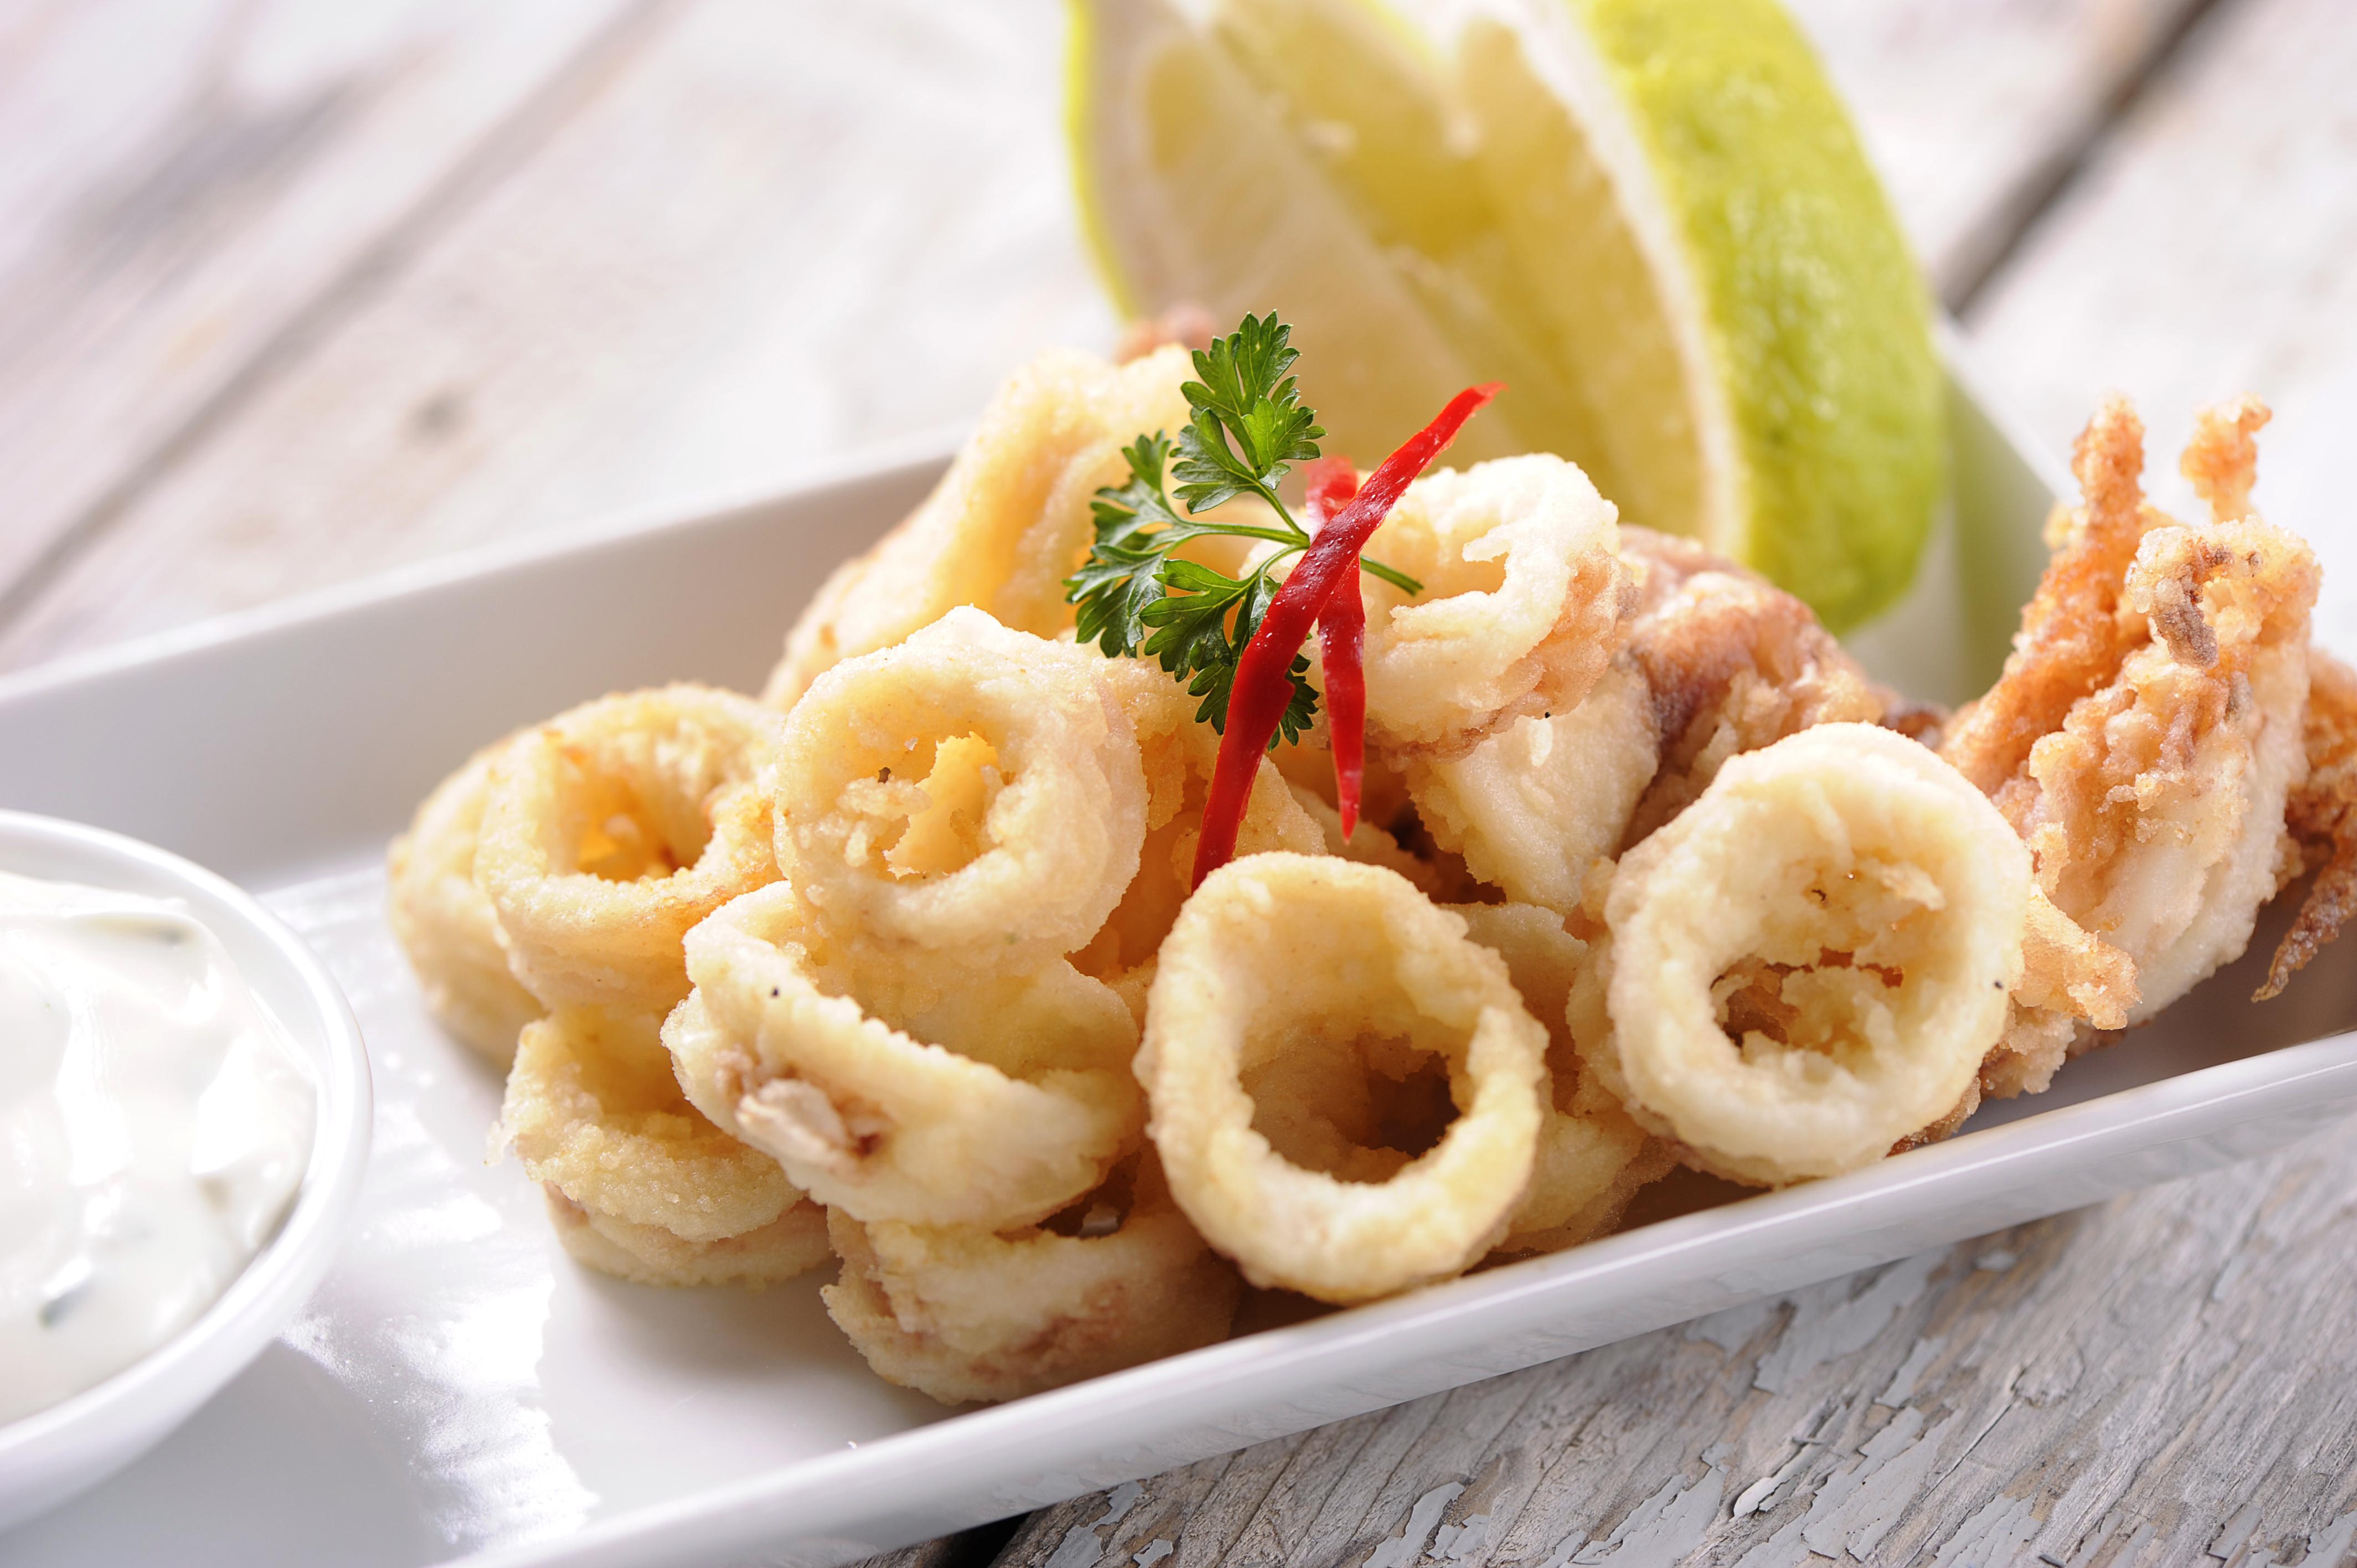 https://bigoven-res.cloudinary.com/image/upload/d_recipe-no-image.jpg/fried-calamari-b81193.jpg